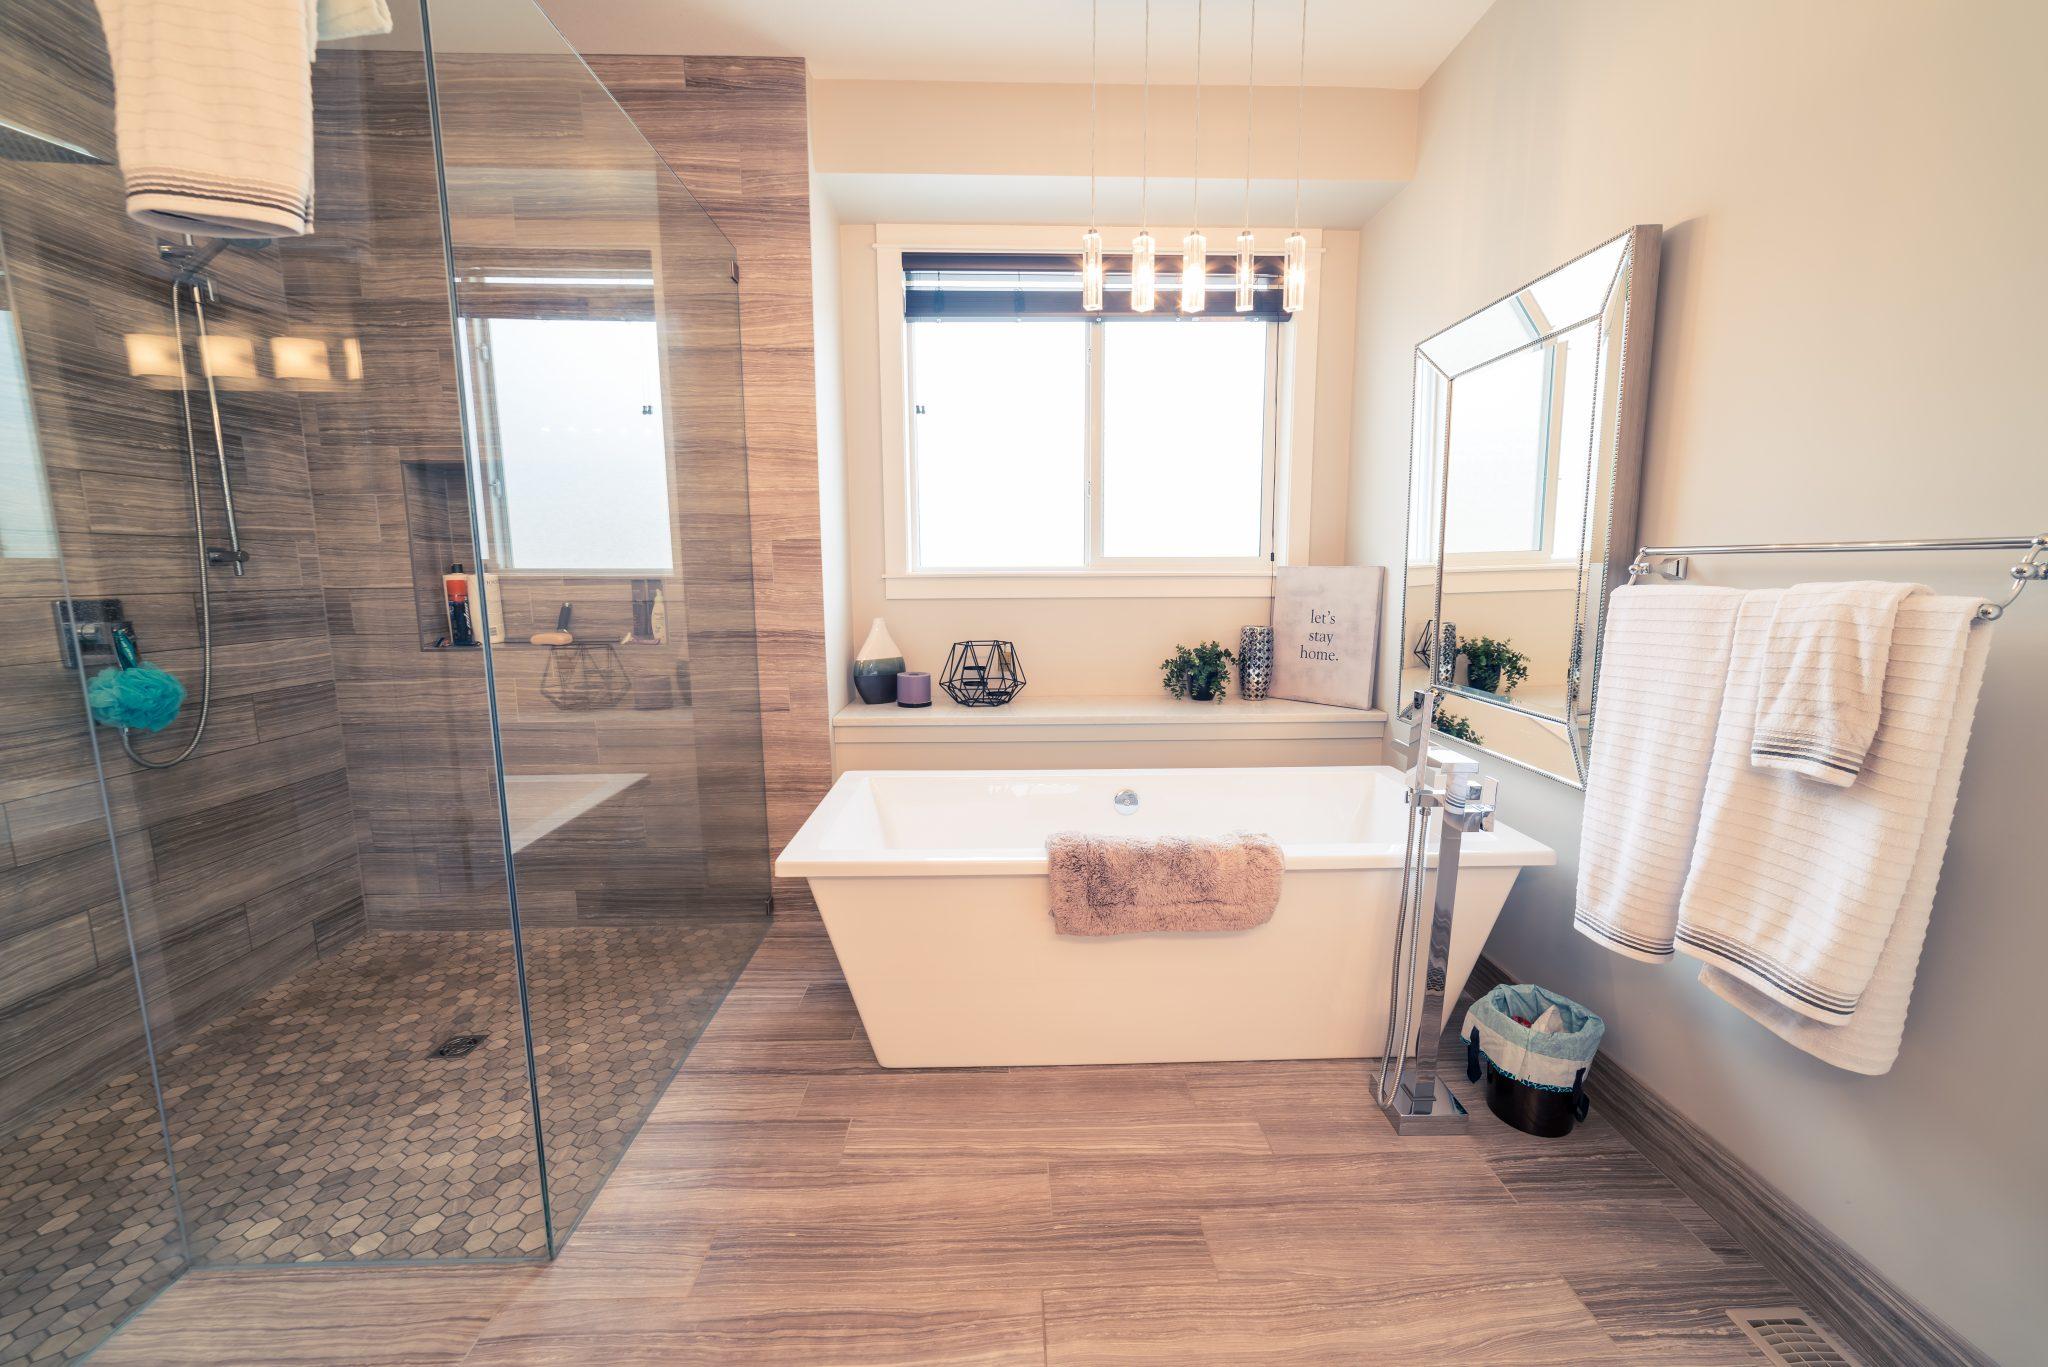 Interior Real Estate Photography | Our Photographers | Photo Studio Kelowna 15